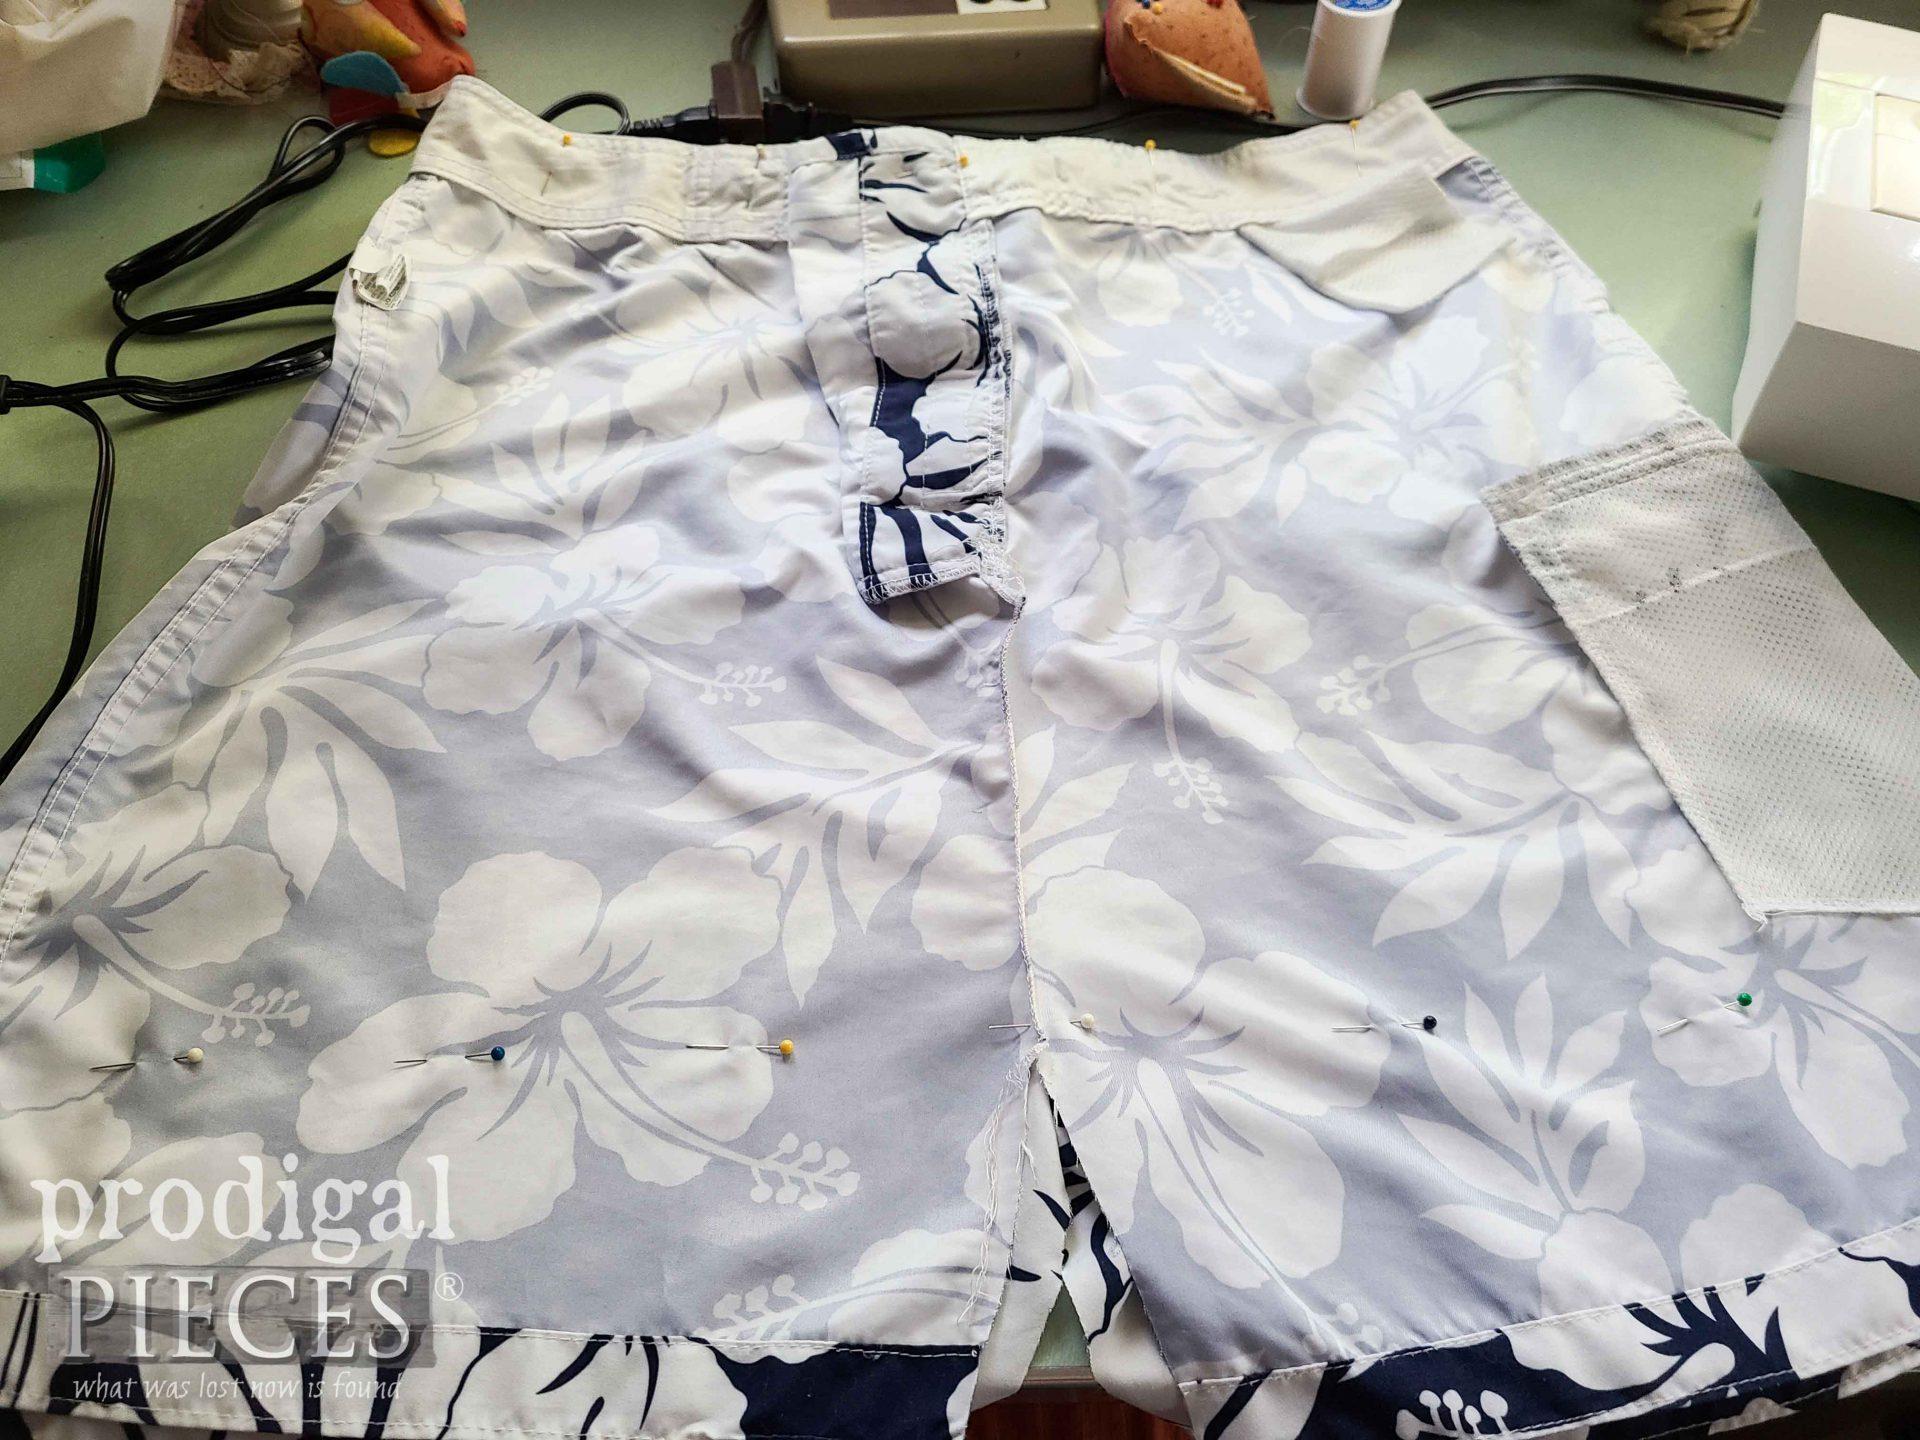 Pinned Swimsuit Trunks Bottom   prodigalpieces.com